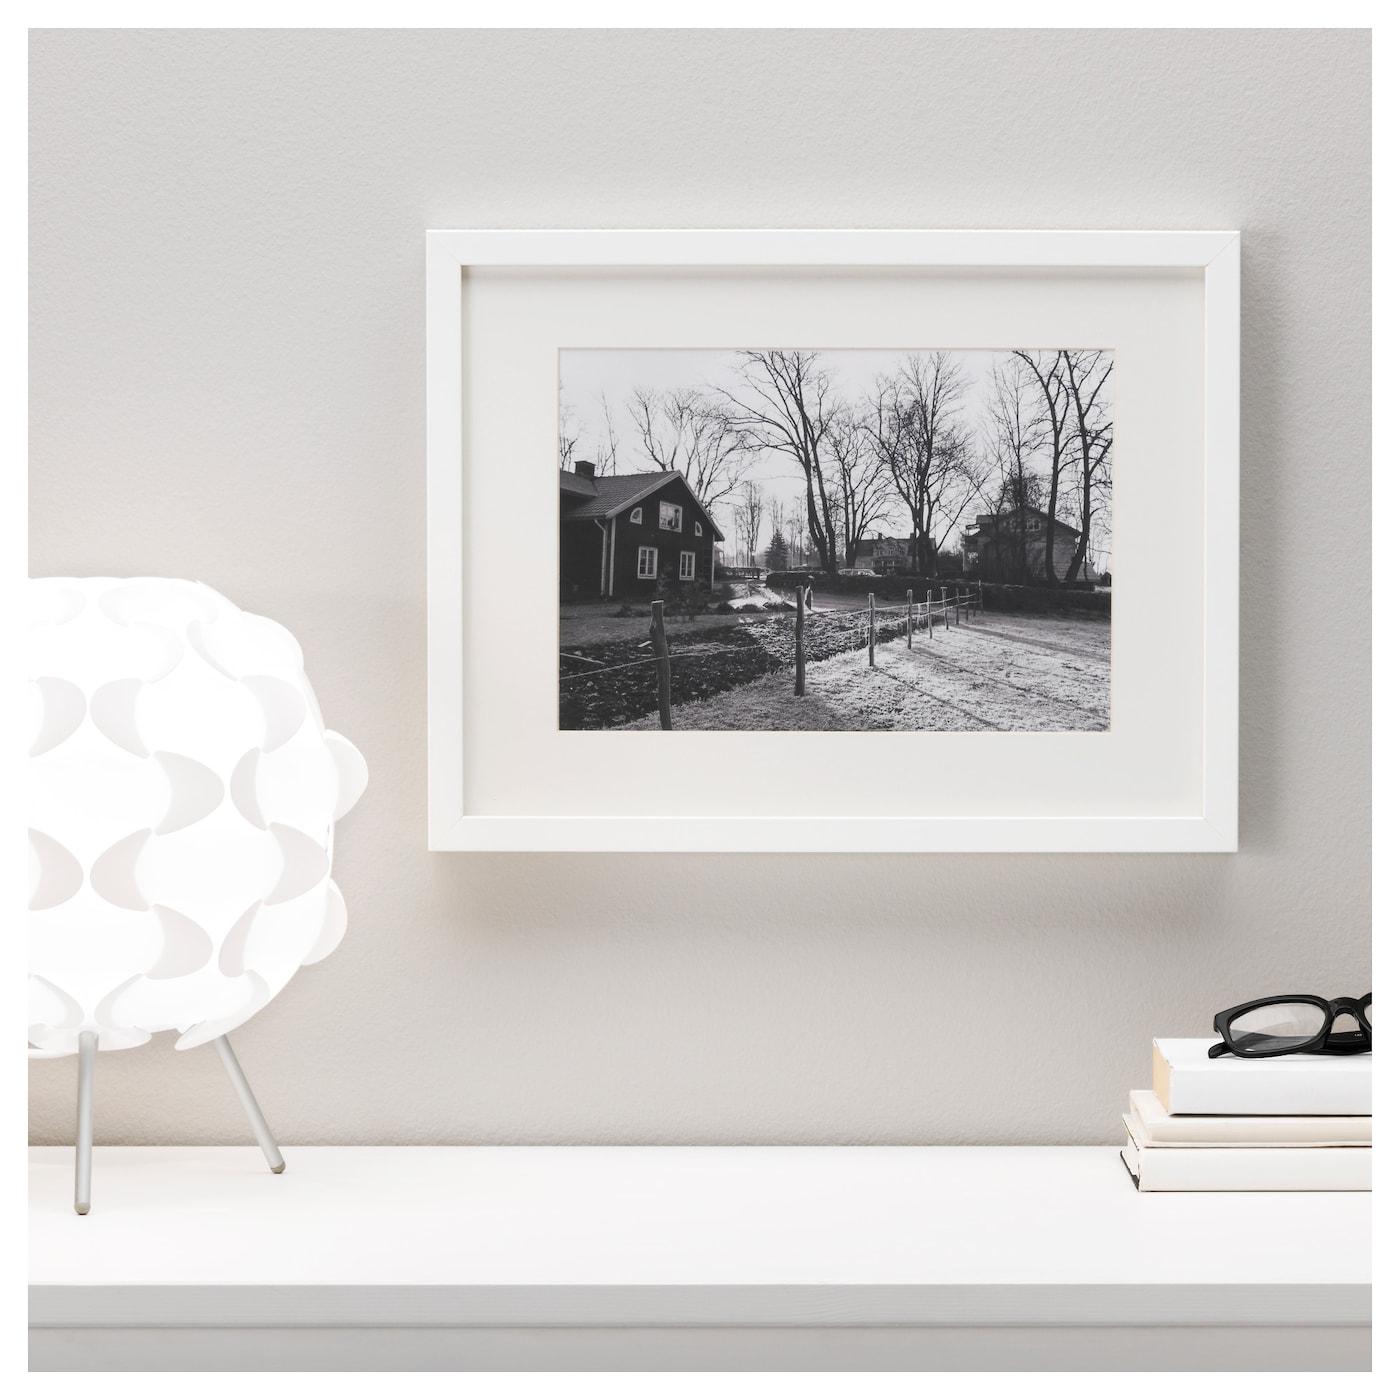 ribba frame white 30x40 cm ikea. Black Bedroom Furniture Sets. Home Design Ideas